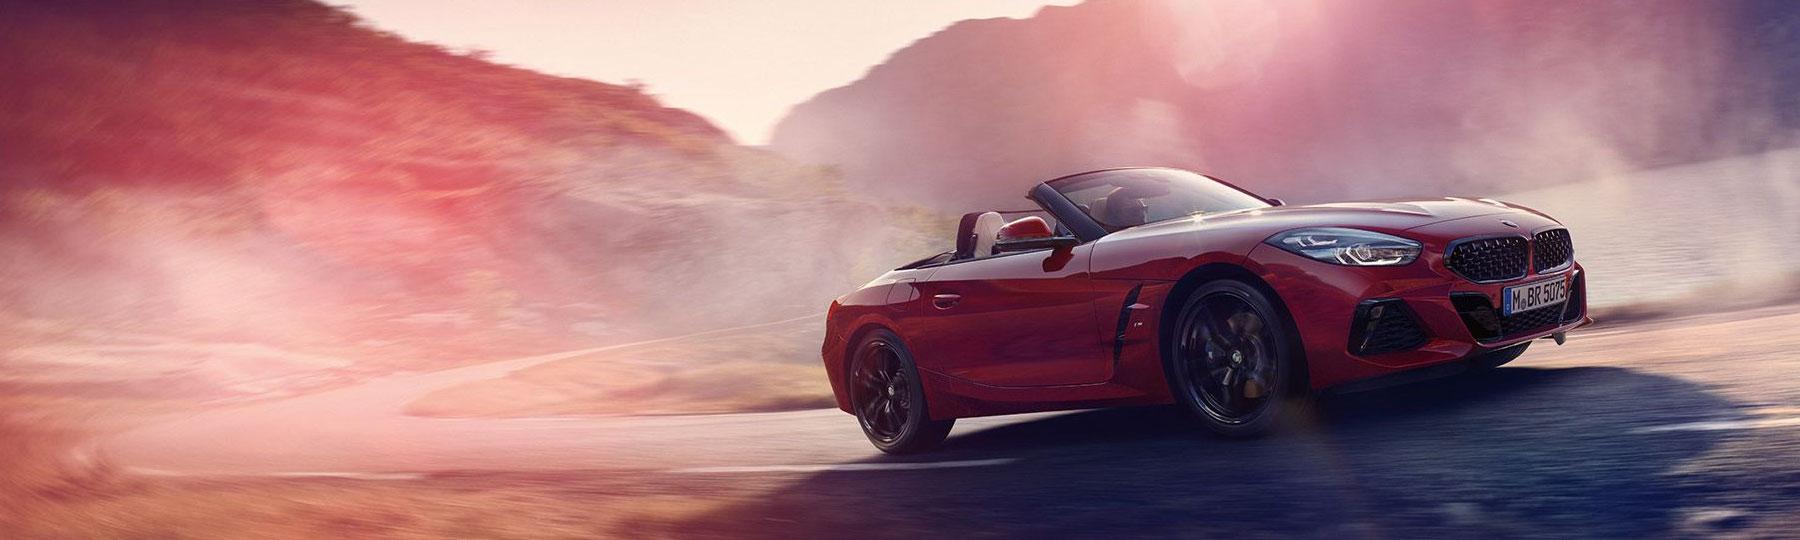 BMW Z4 New Car Offer